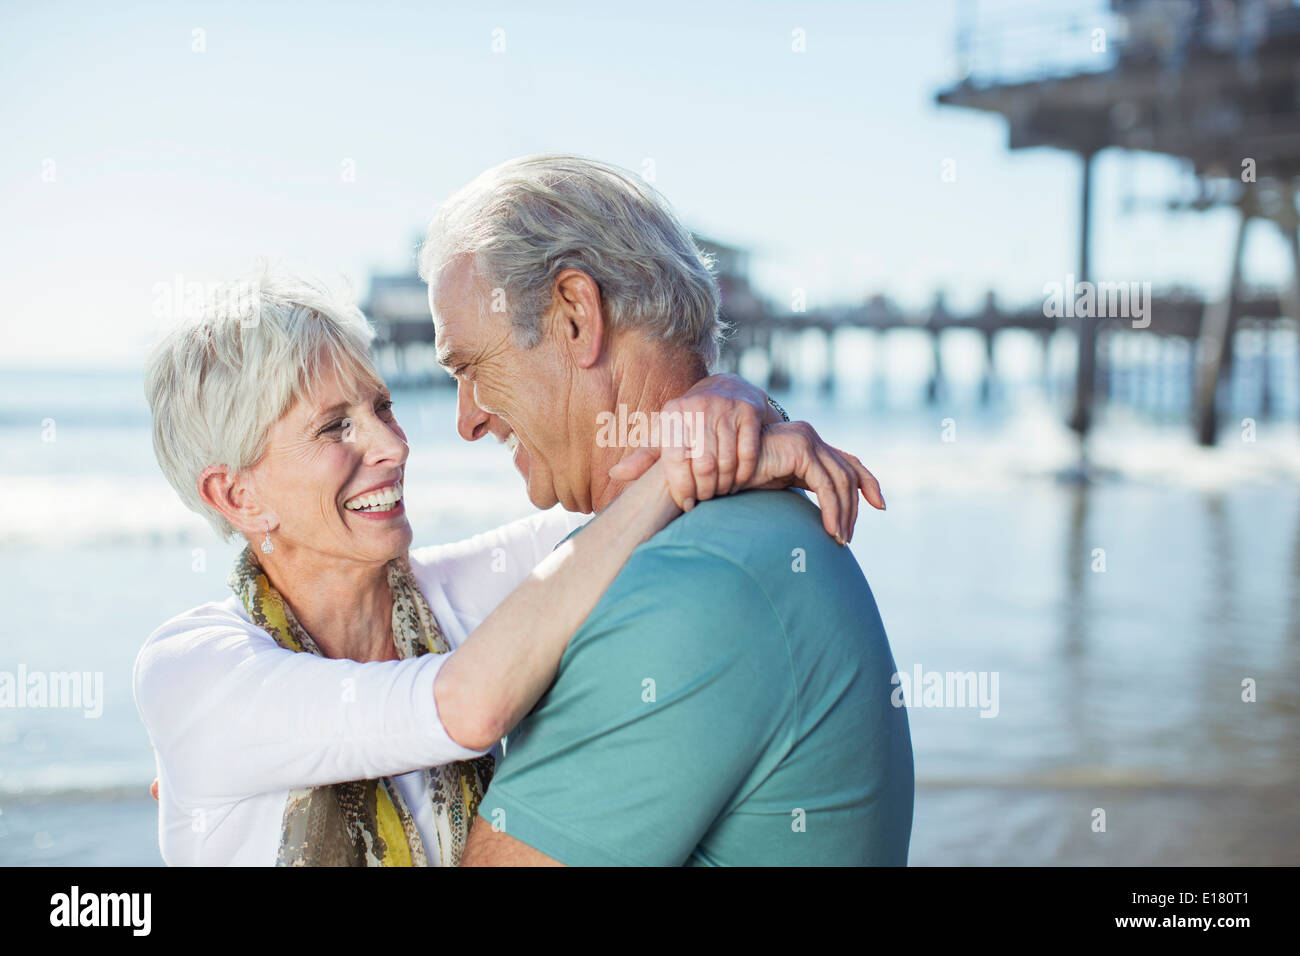 Senior couple hugging on beach - Stock Image